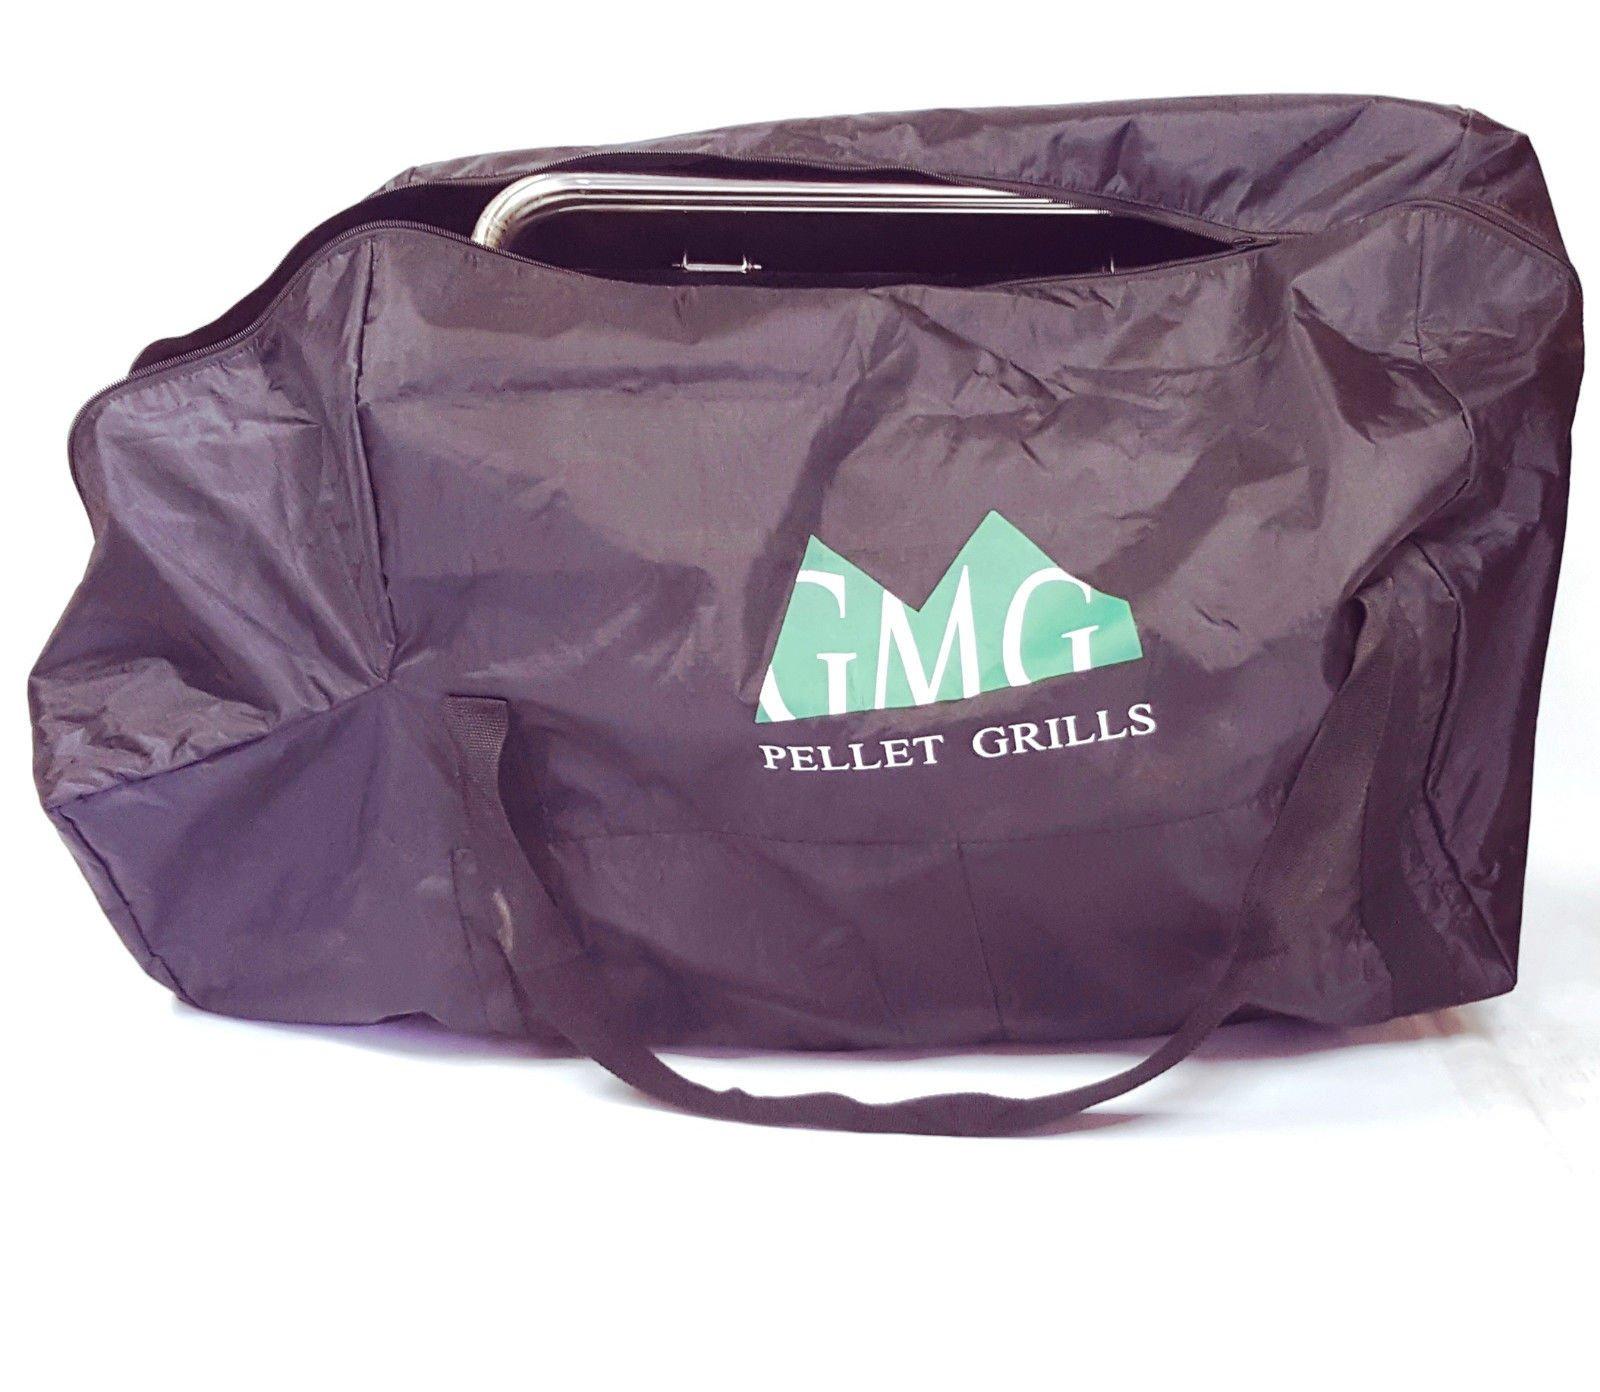 GMG TOTE BAG Davy Crockett Green Mountain Grill BBQ Part GMG-6014 BLACK - SALE! .#GH45843 3468-T34562FD765363